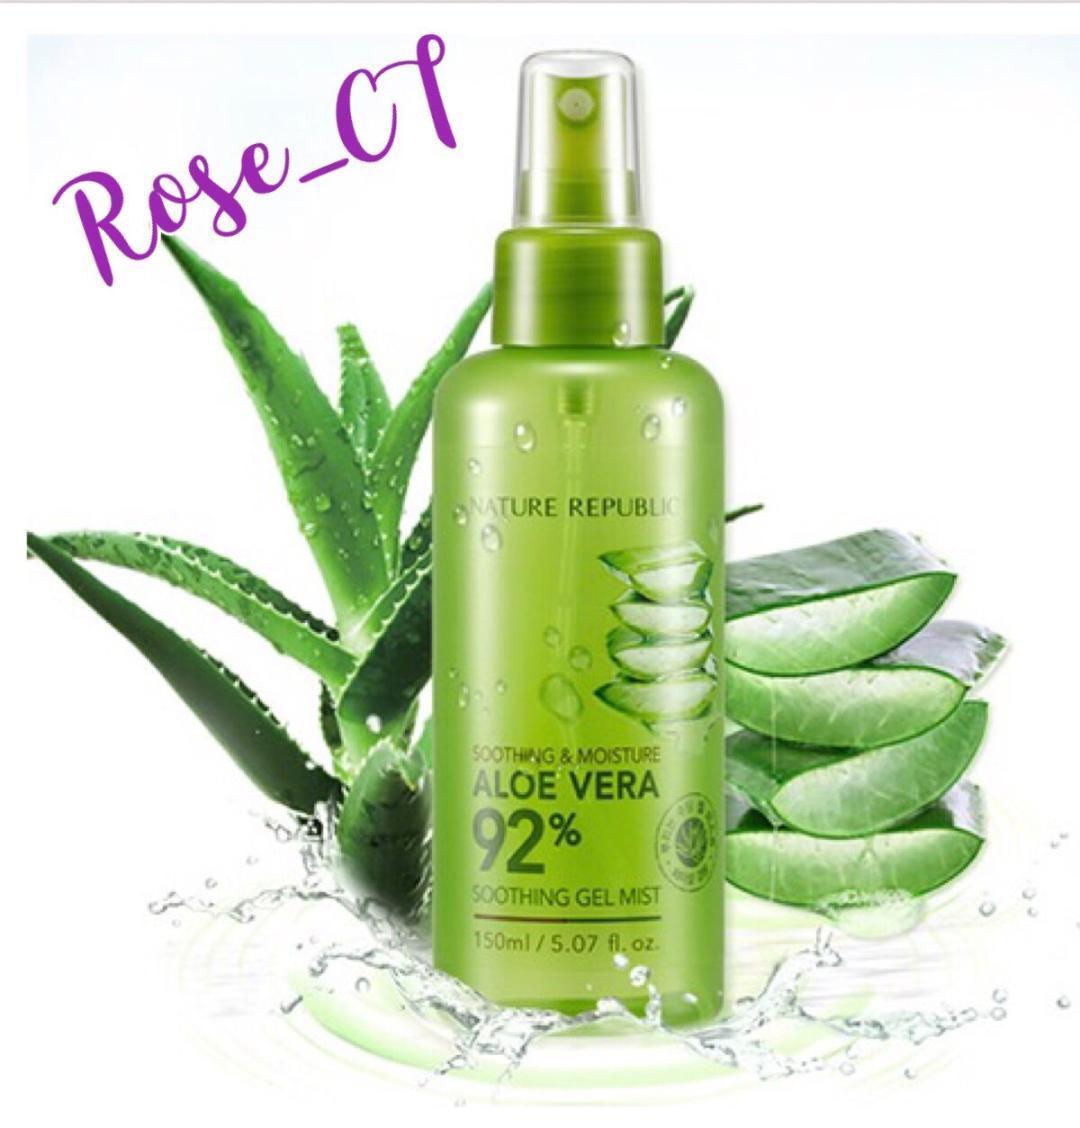 Buy Nature Republic Skin Care Online Lazada Aloe Vera 92 Soothing Moisture Gel Mist 150ml